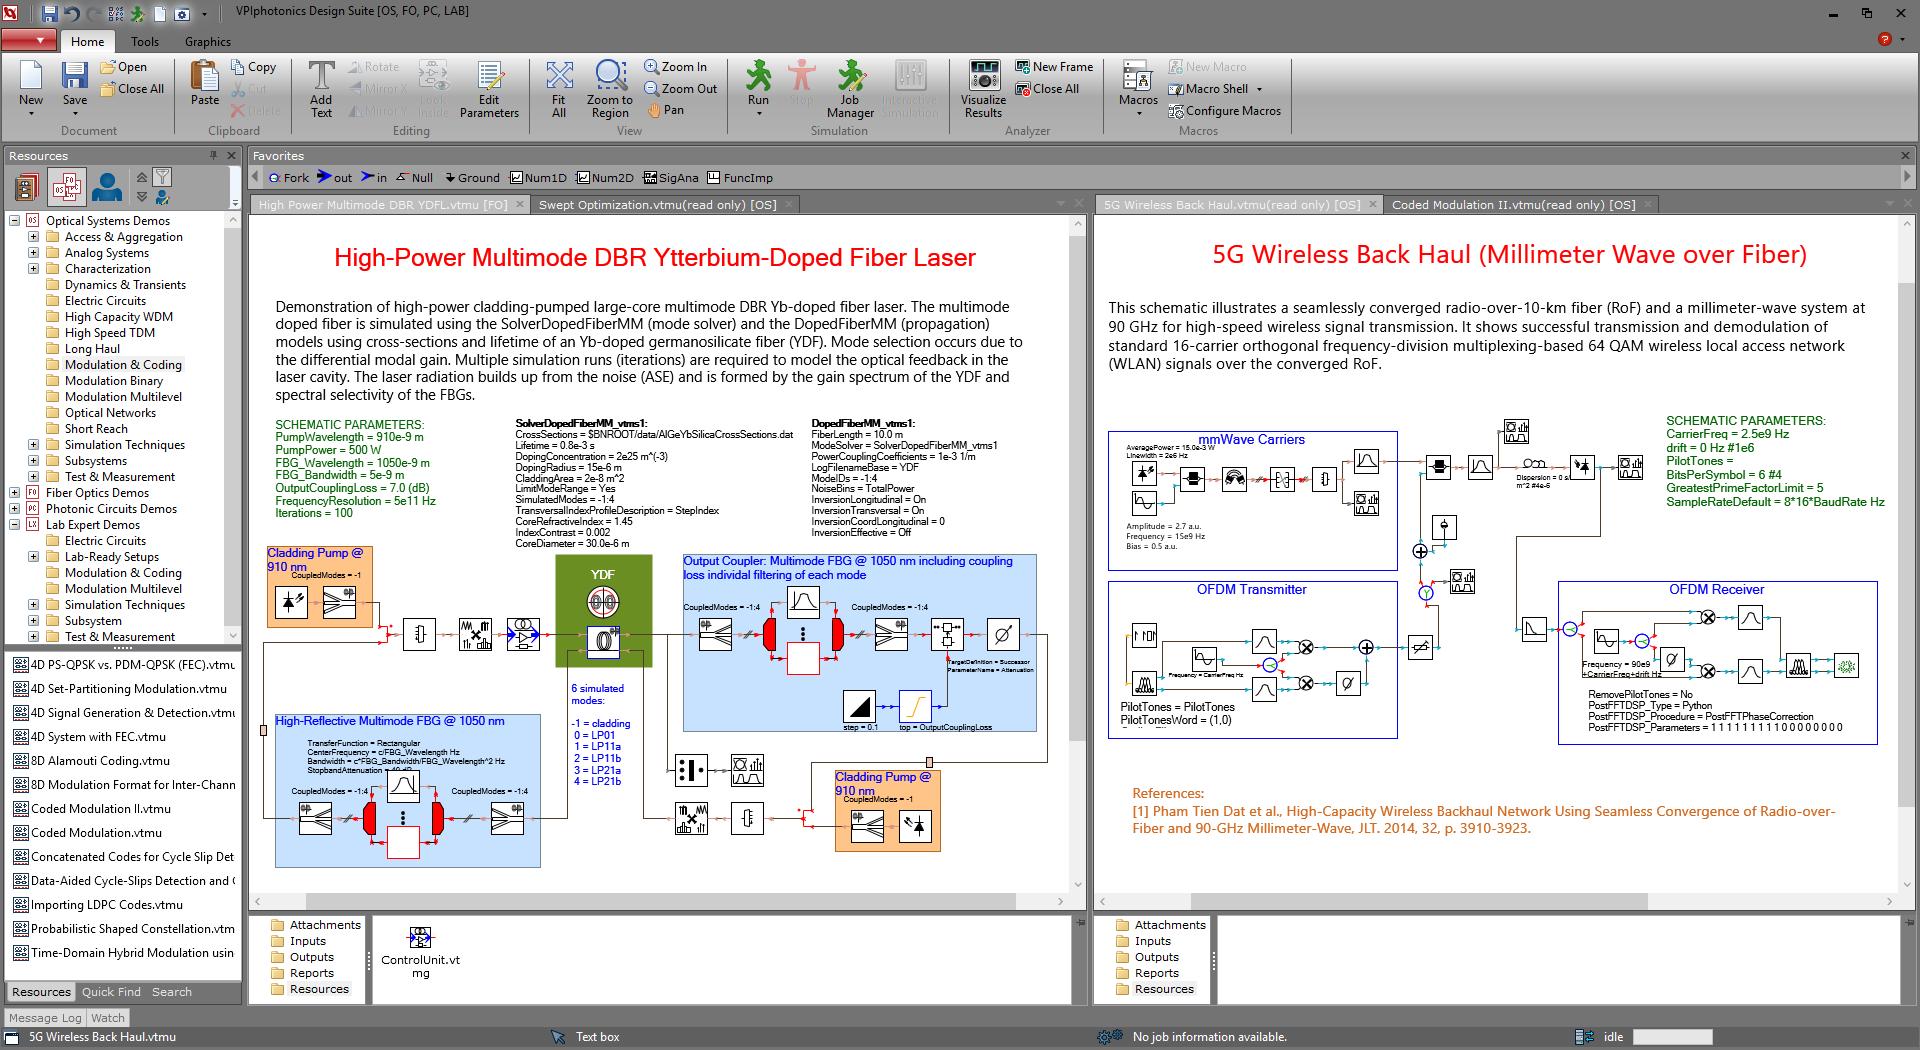 VPIphotonics Design Suite v9 8